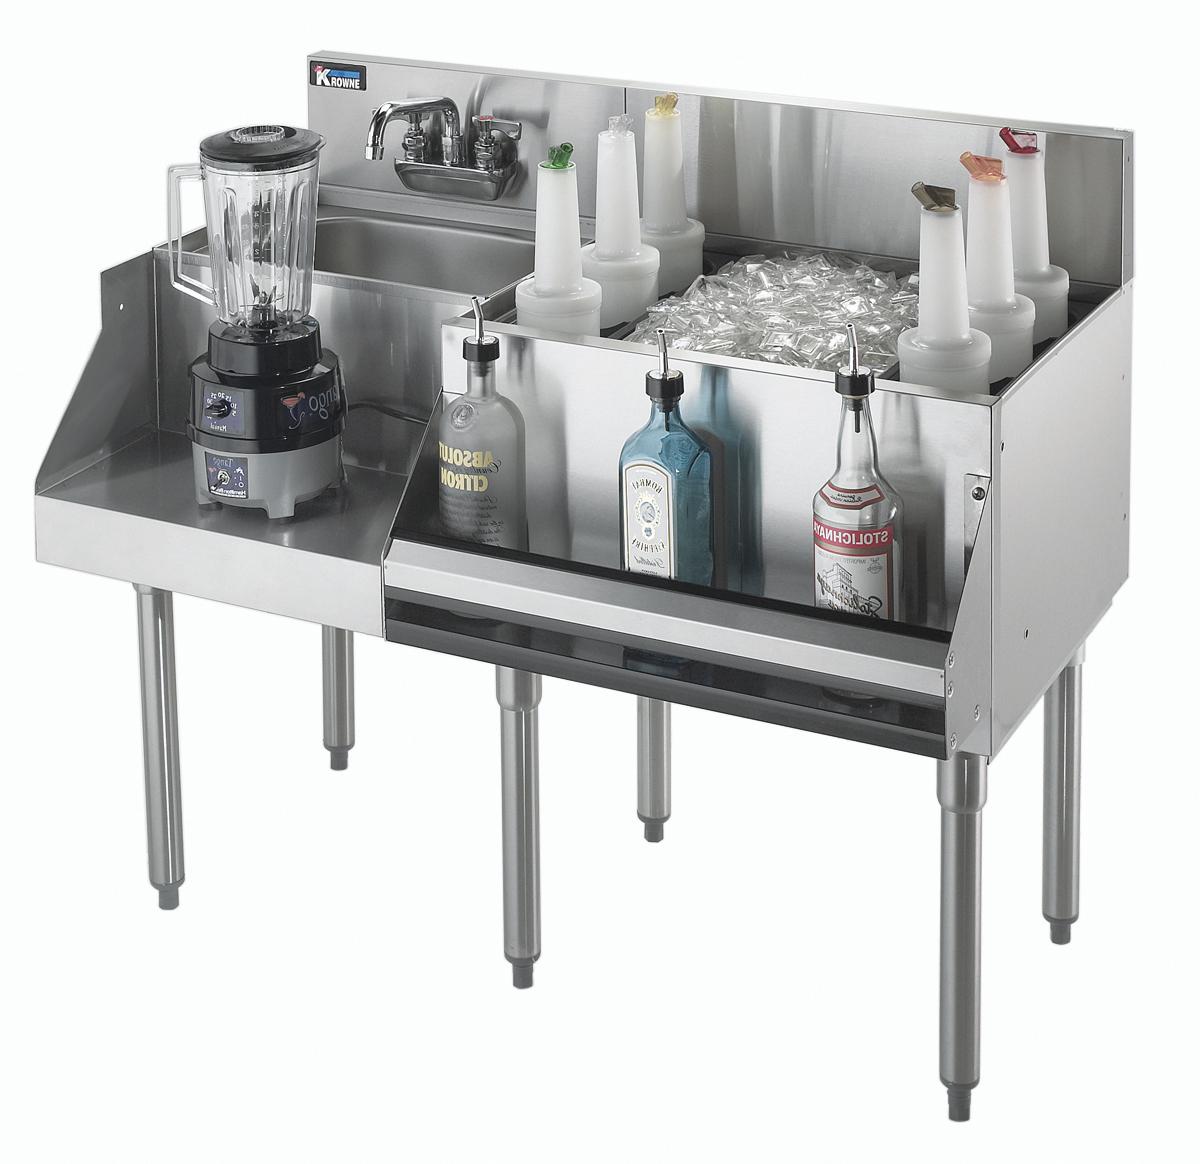 Krowne Metal KR21-W42R-10 underbar ice bin/cocktail station, blender station